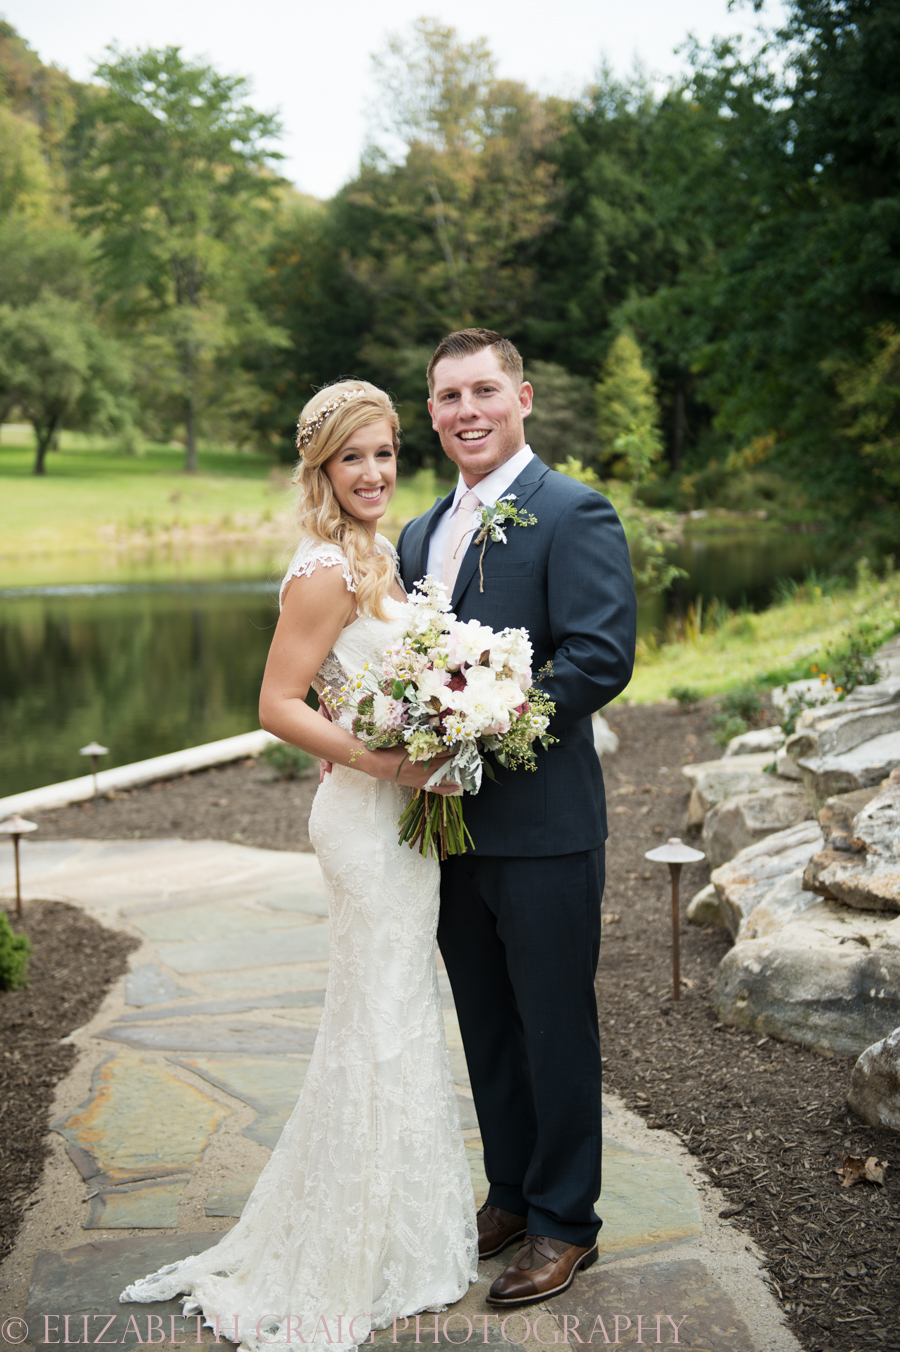 Dubois Brockway St. Marys PA Weddings-0118